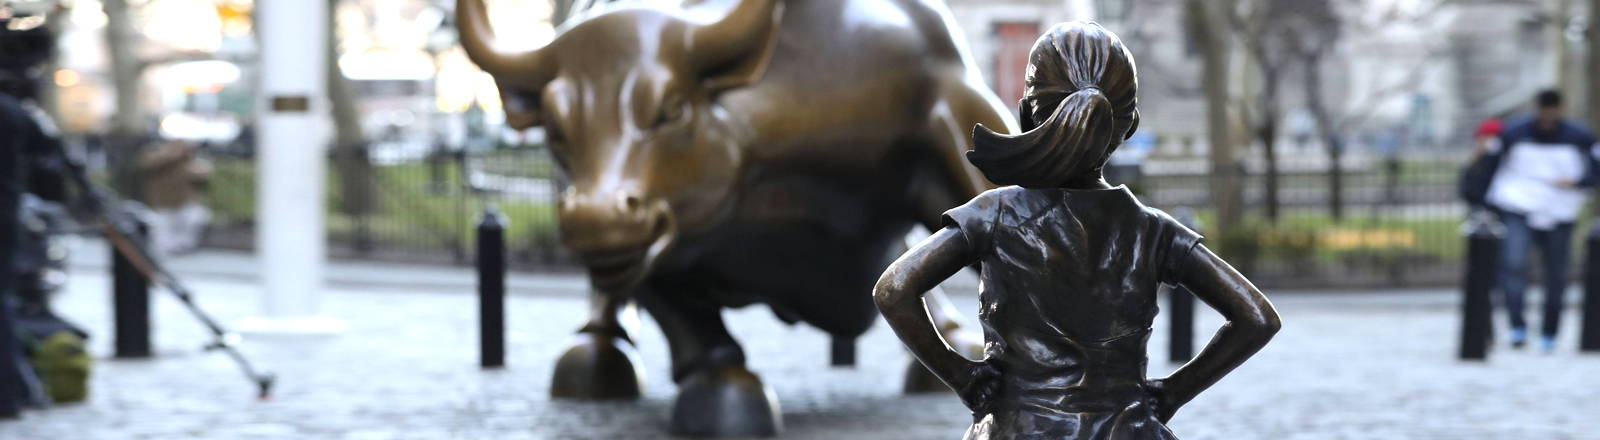 Statue Fearless Girl auf der New Yorker Wall Street